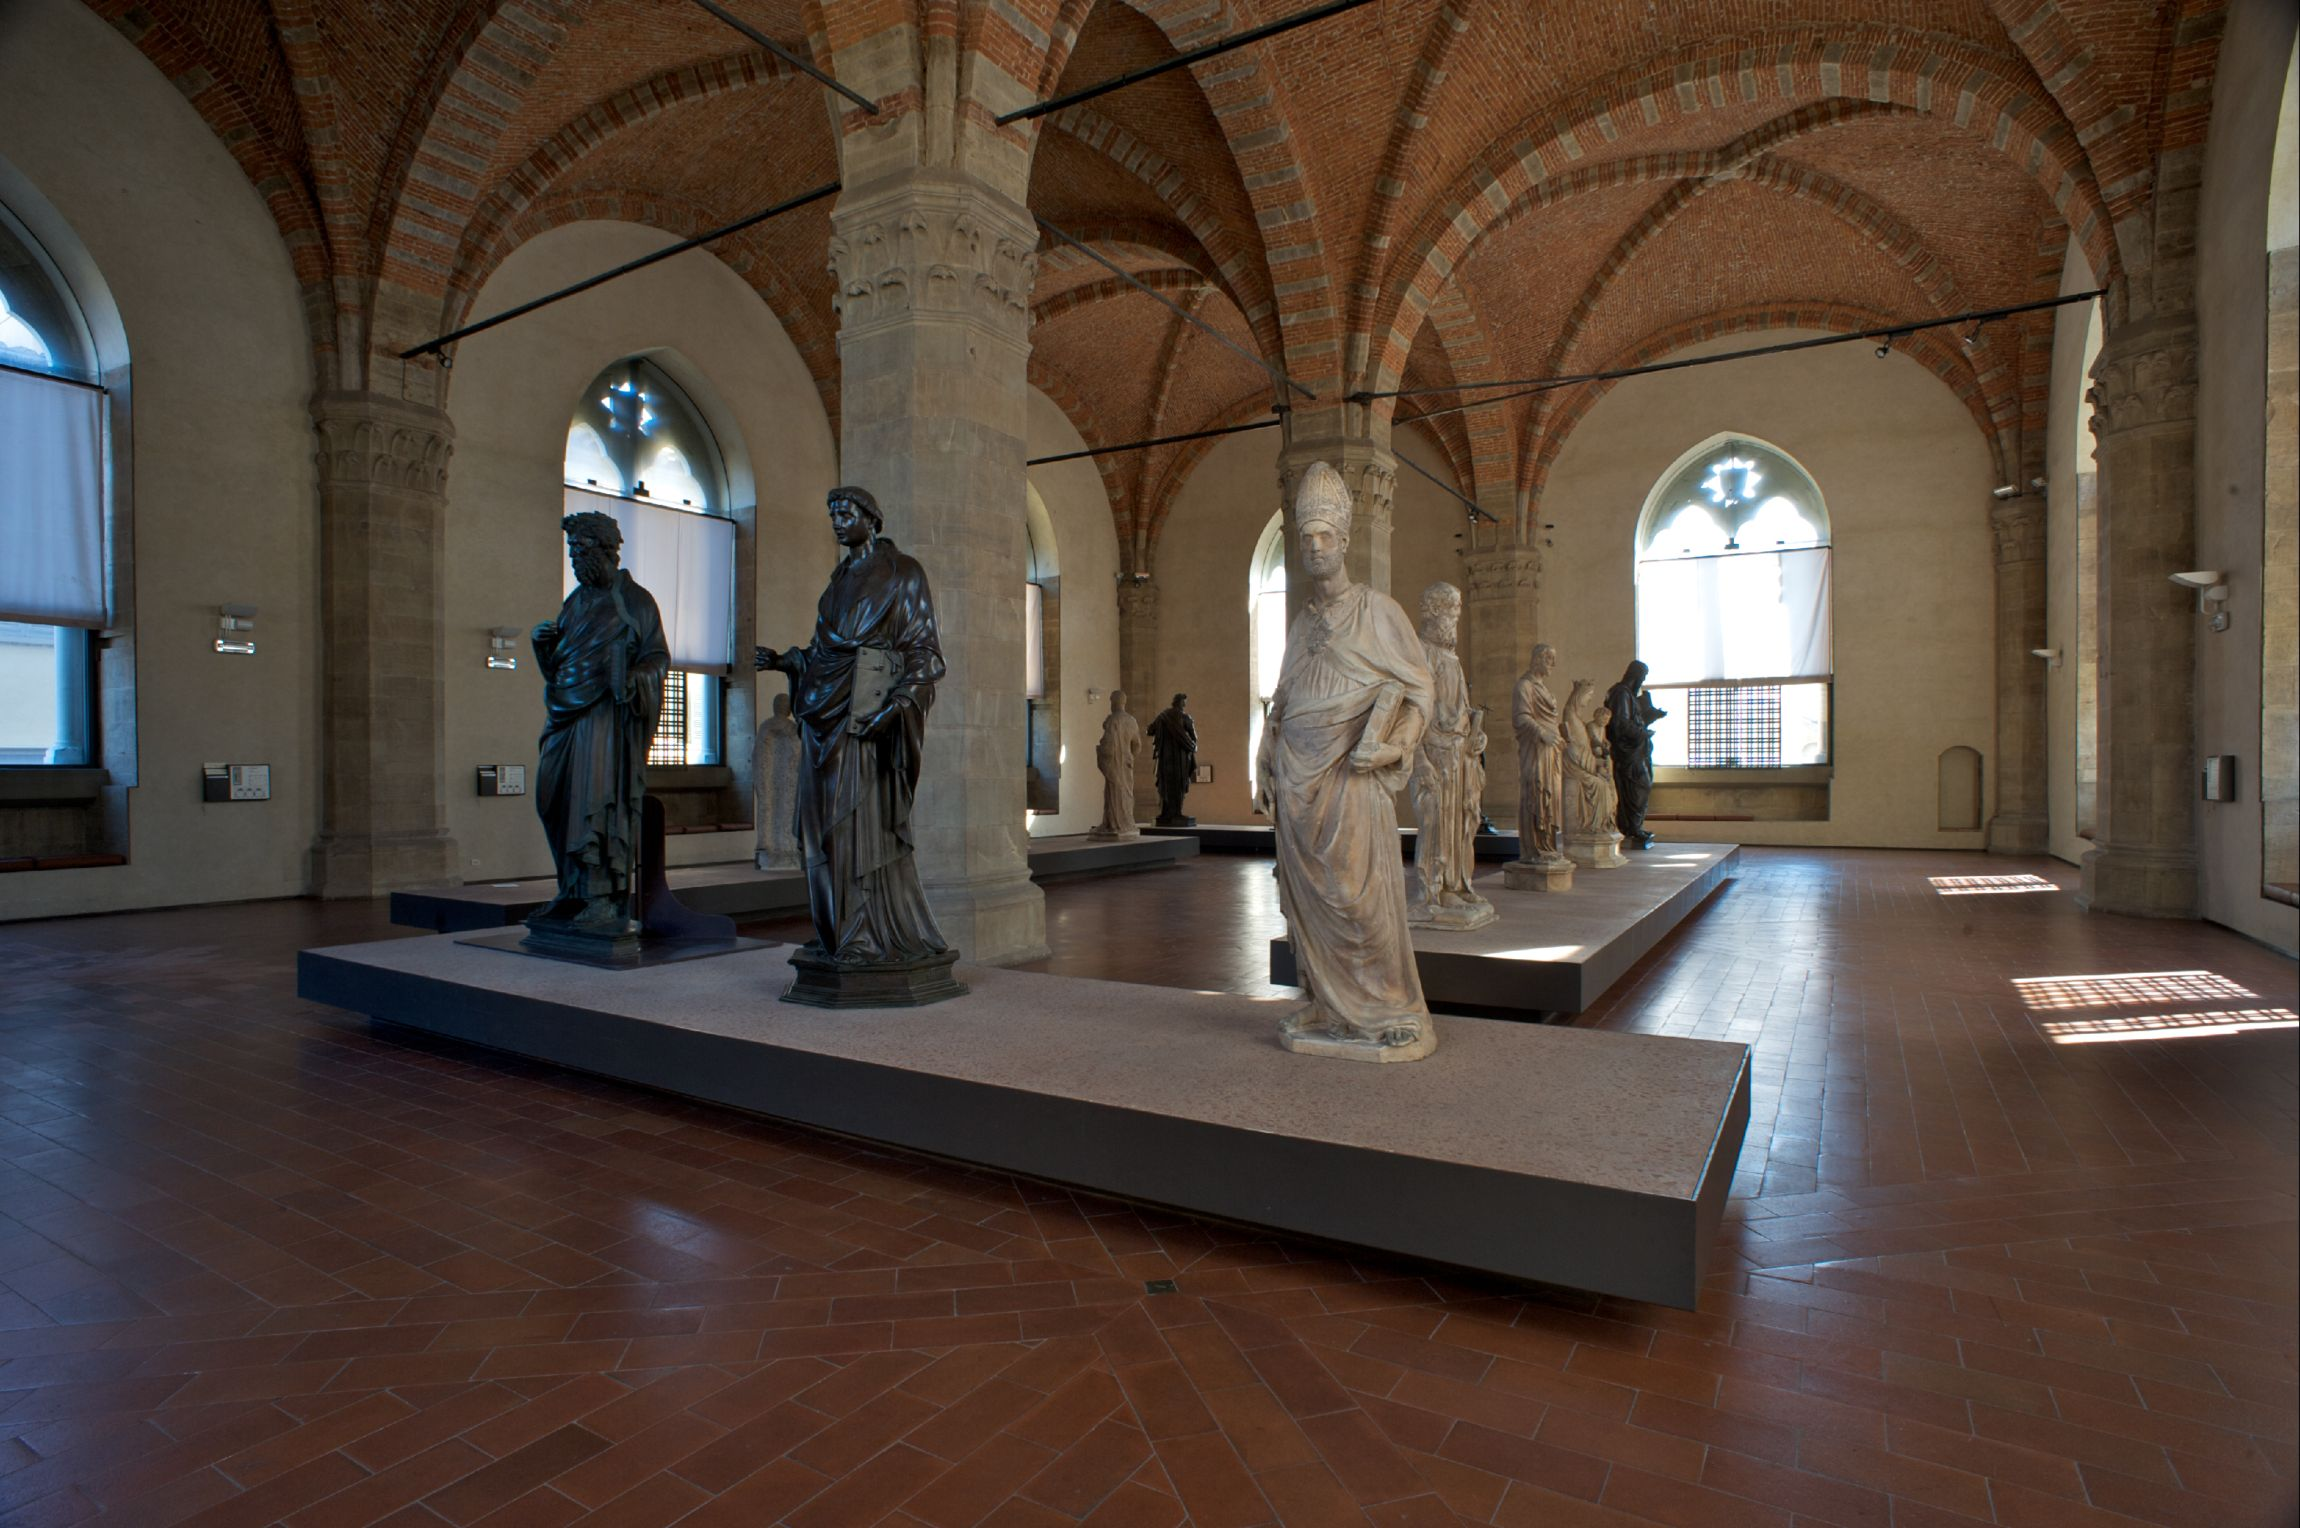 Museo di Orsanmichele, Firenze